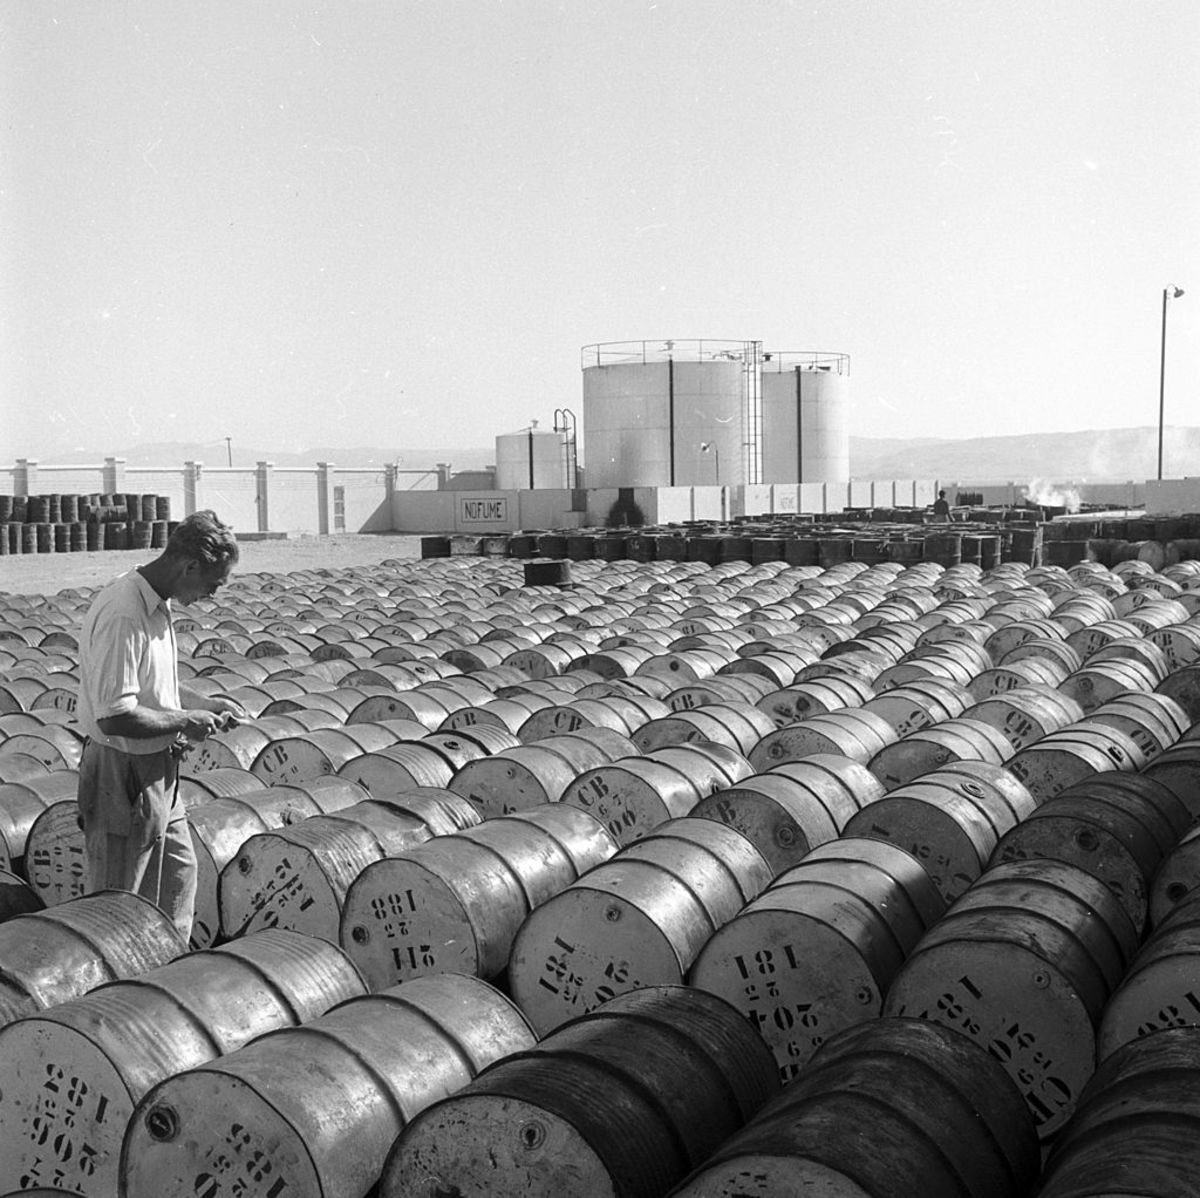 Losing 4.3 Billion Barrels Is Good For Exxon thumbnail